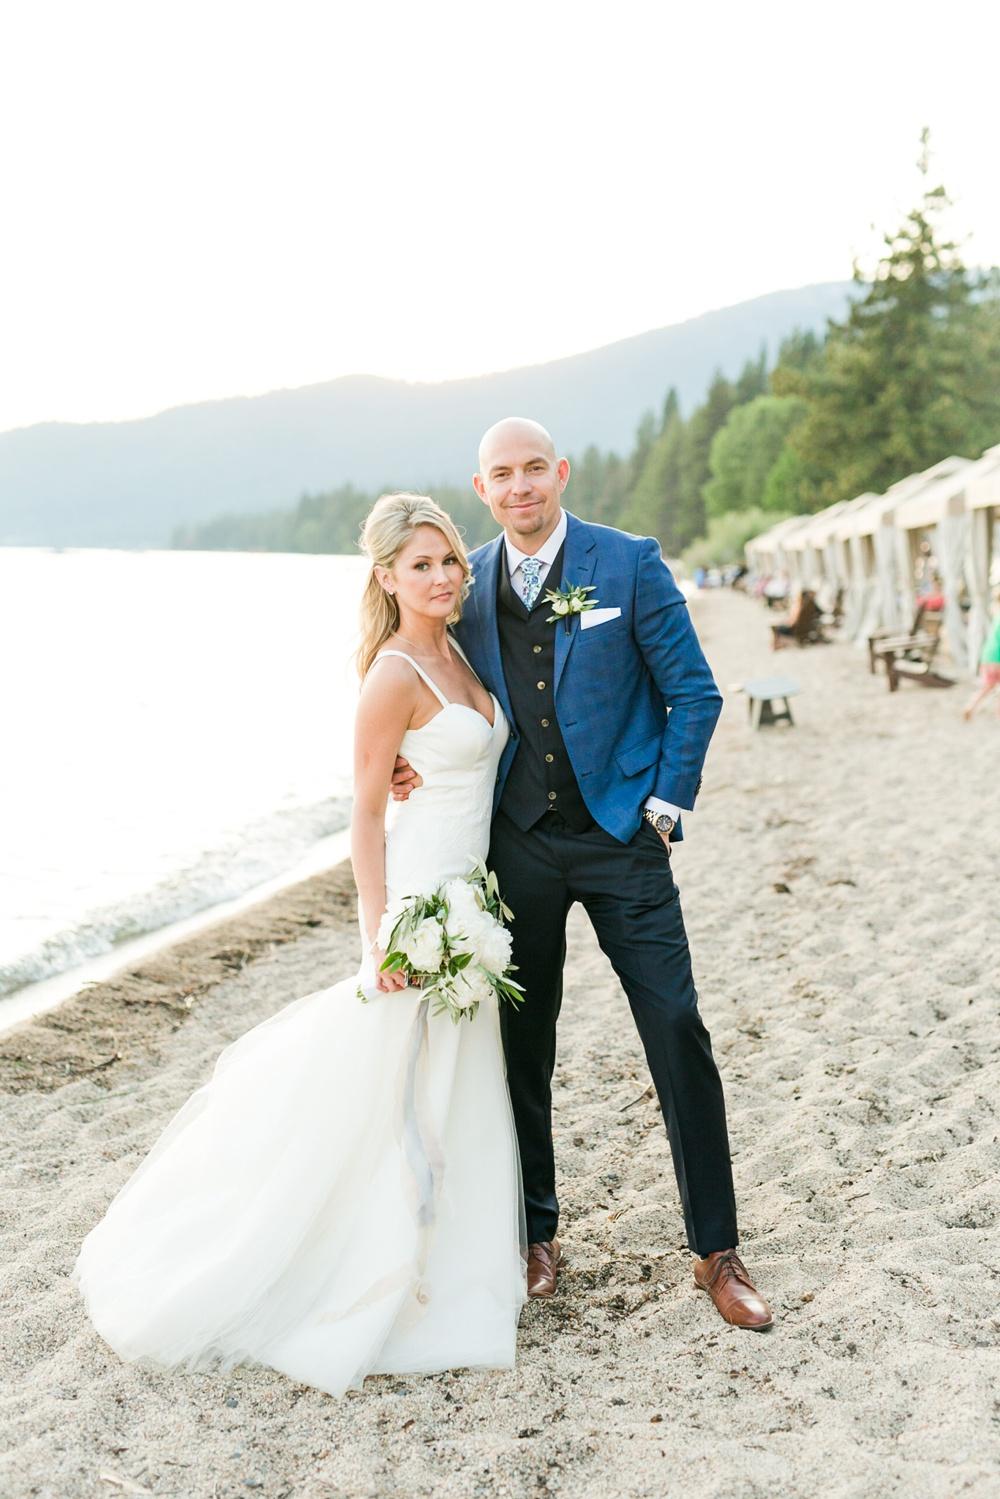 Hyatt-Lake-Tahoe-Wedding-Photographer-Regency-Mandy-Ford-Photography_0056.jpg